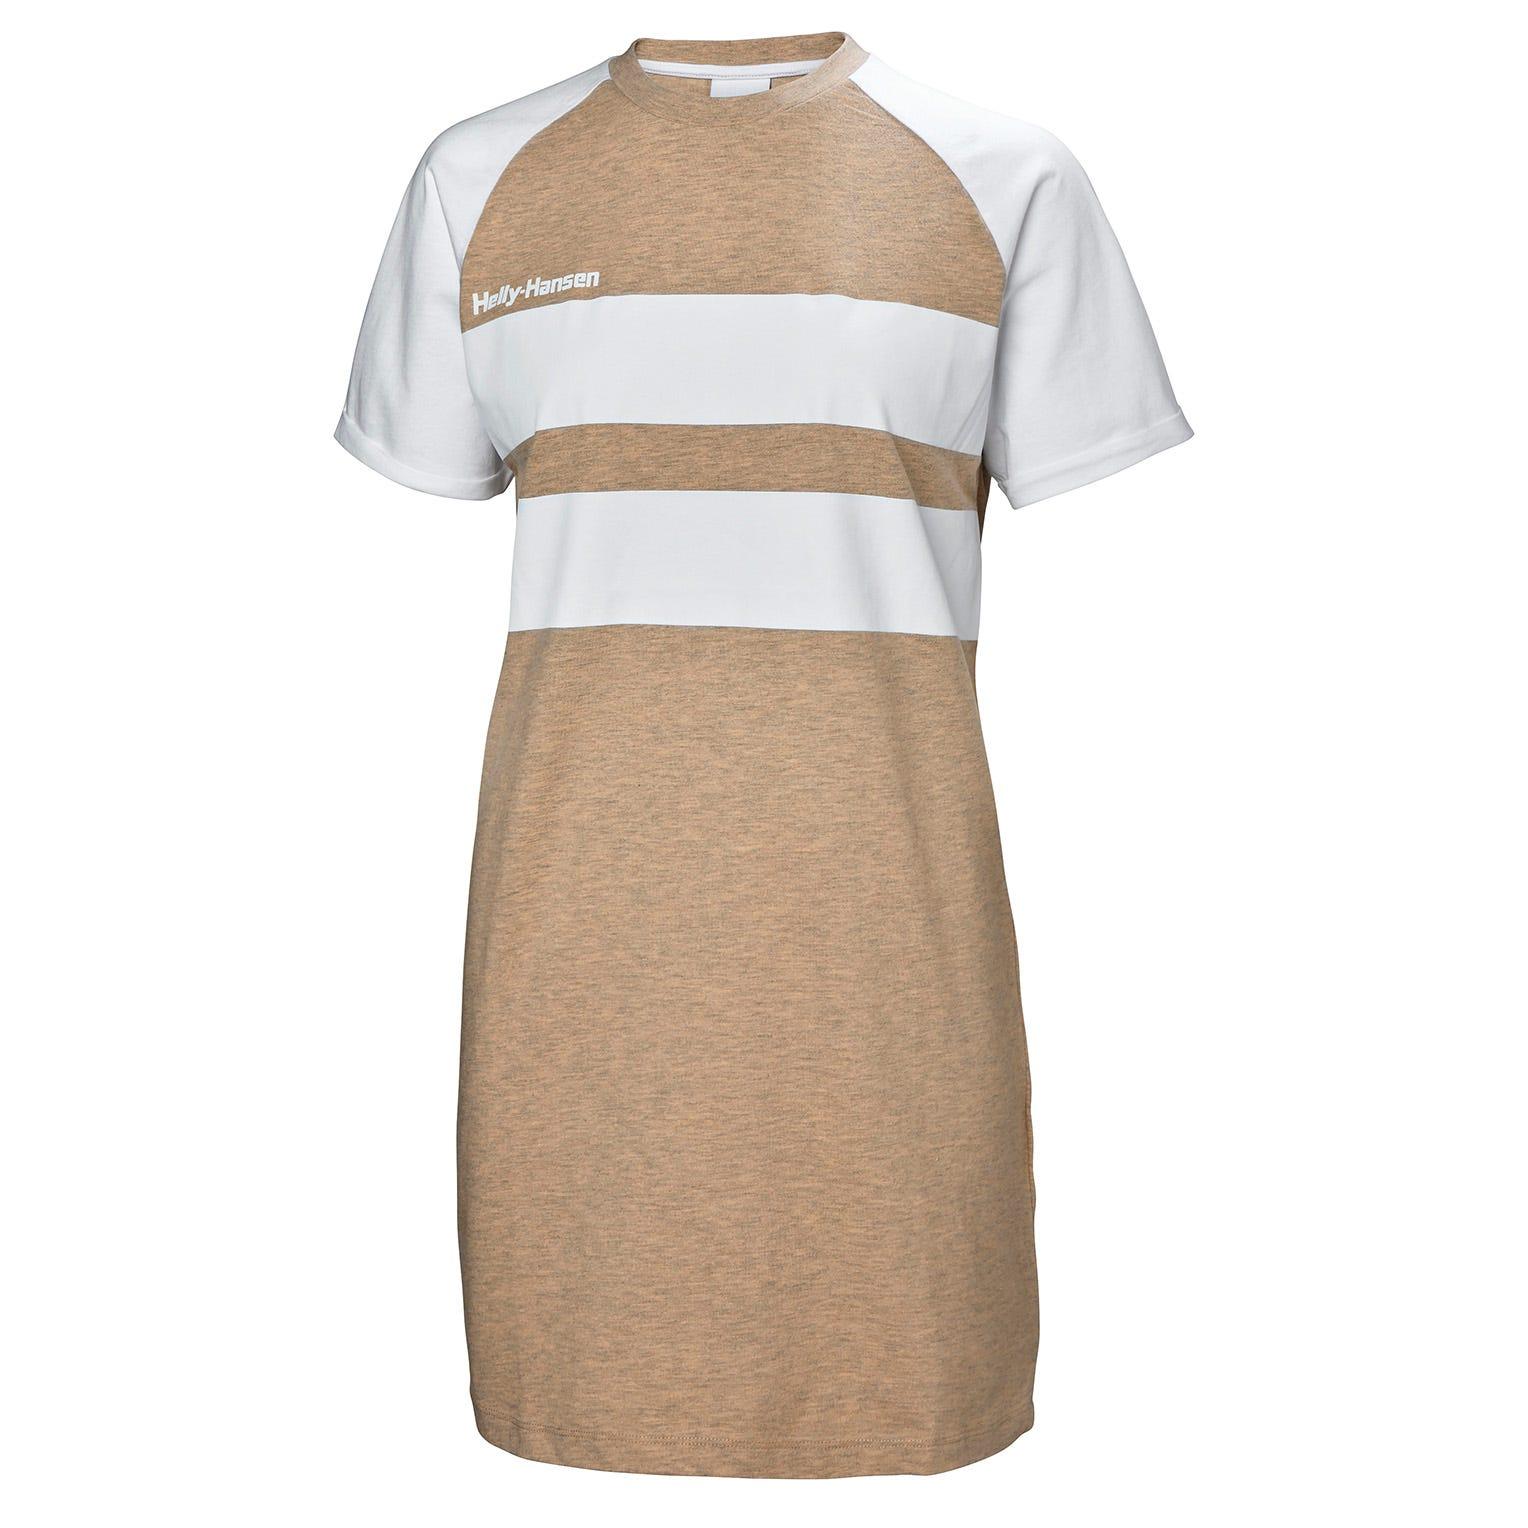 Helly Hansen Heritage Tshirt Dress Womens Rain Jacket Beige L